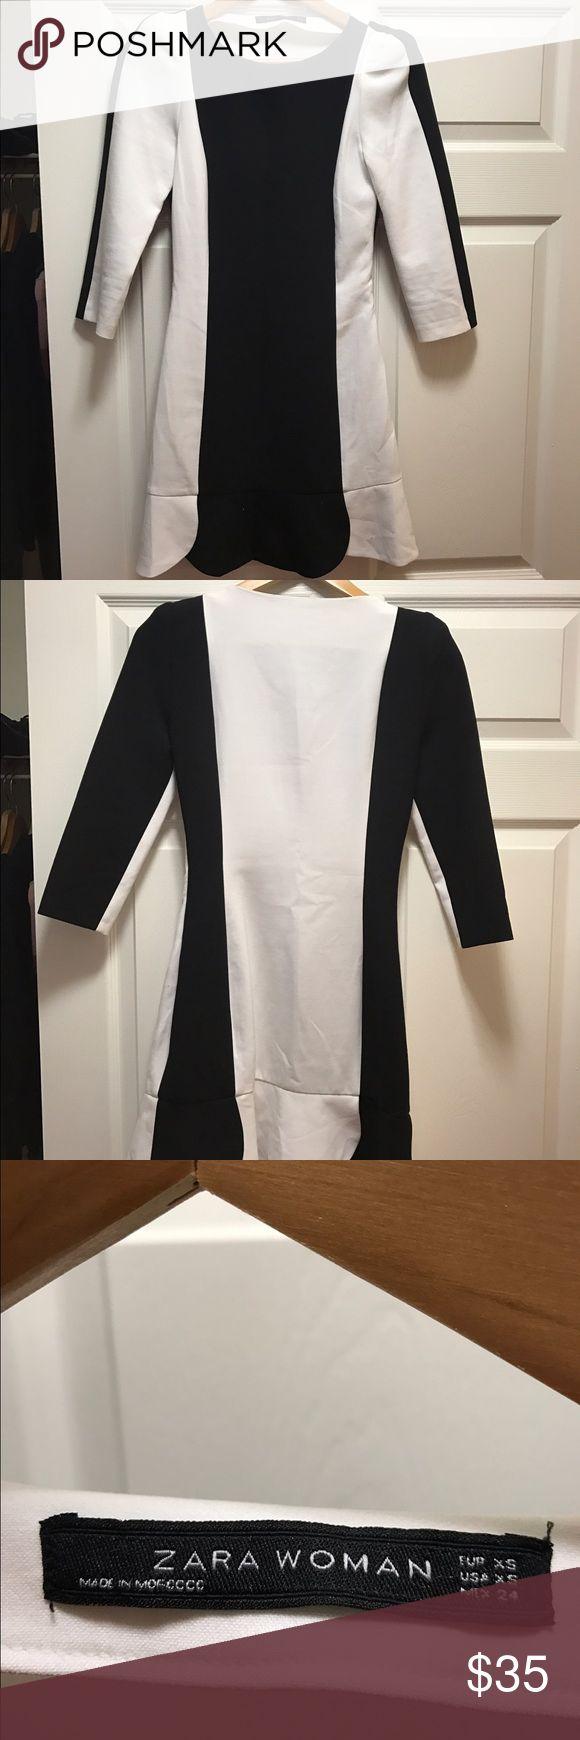 Zara Woman Black And White Mini Dress Super sexy! Worn only few times. Very good condition. Size XS. Zara Dresses Mini